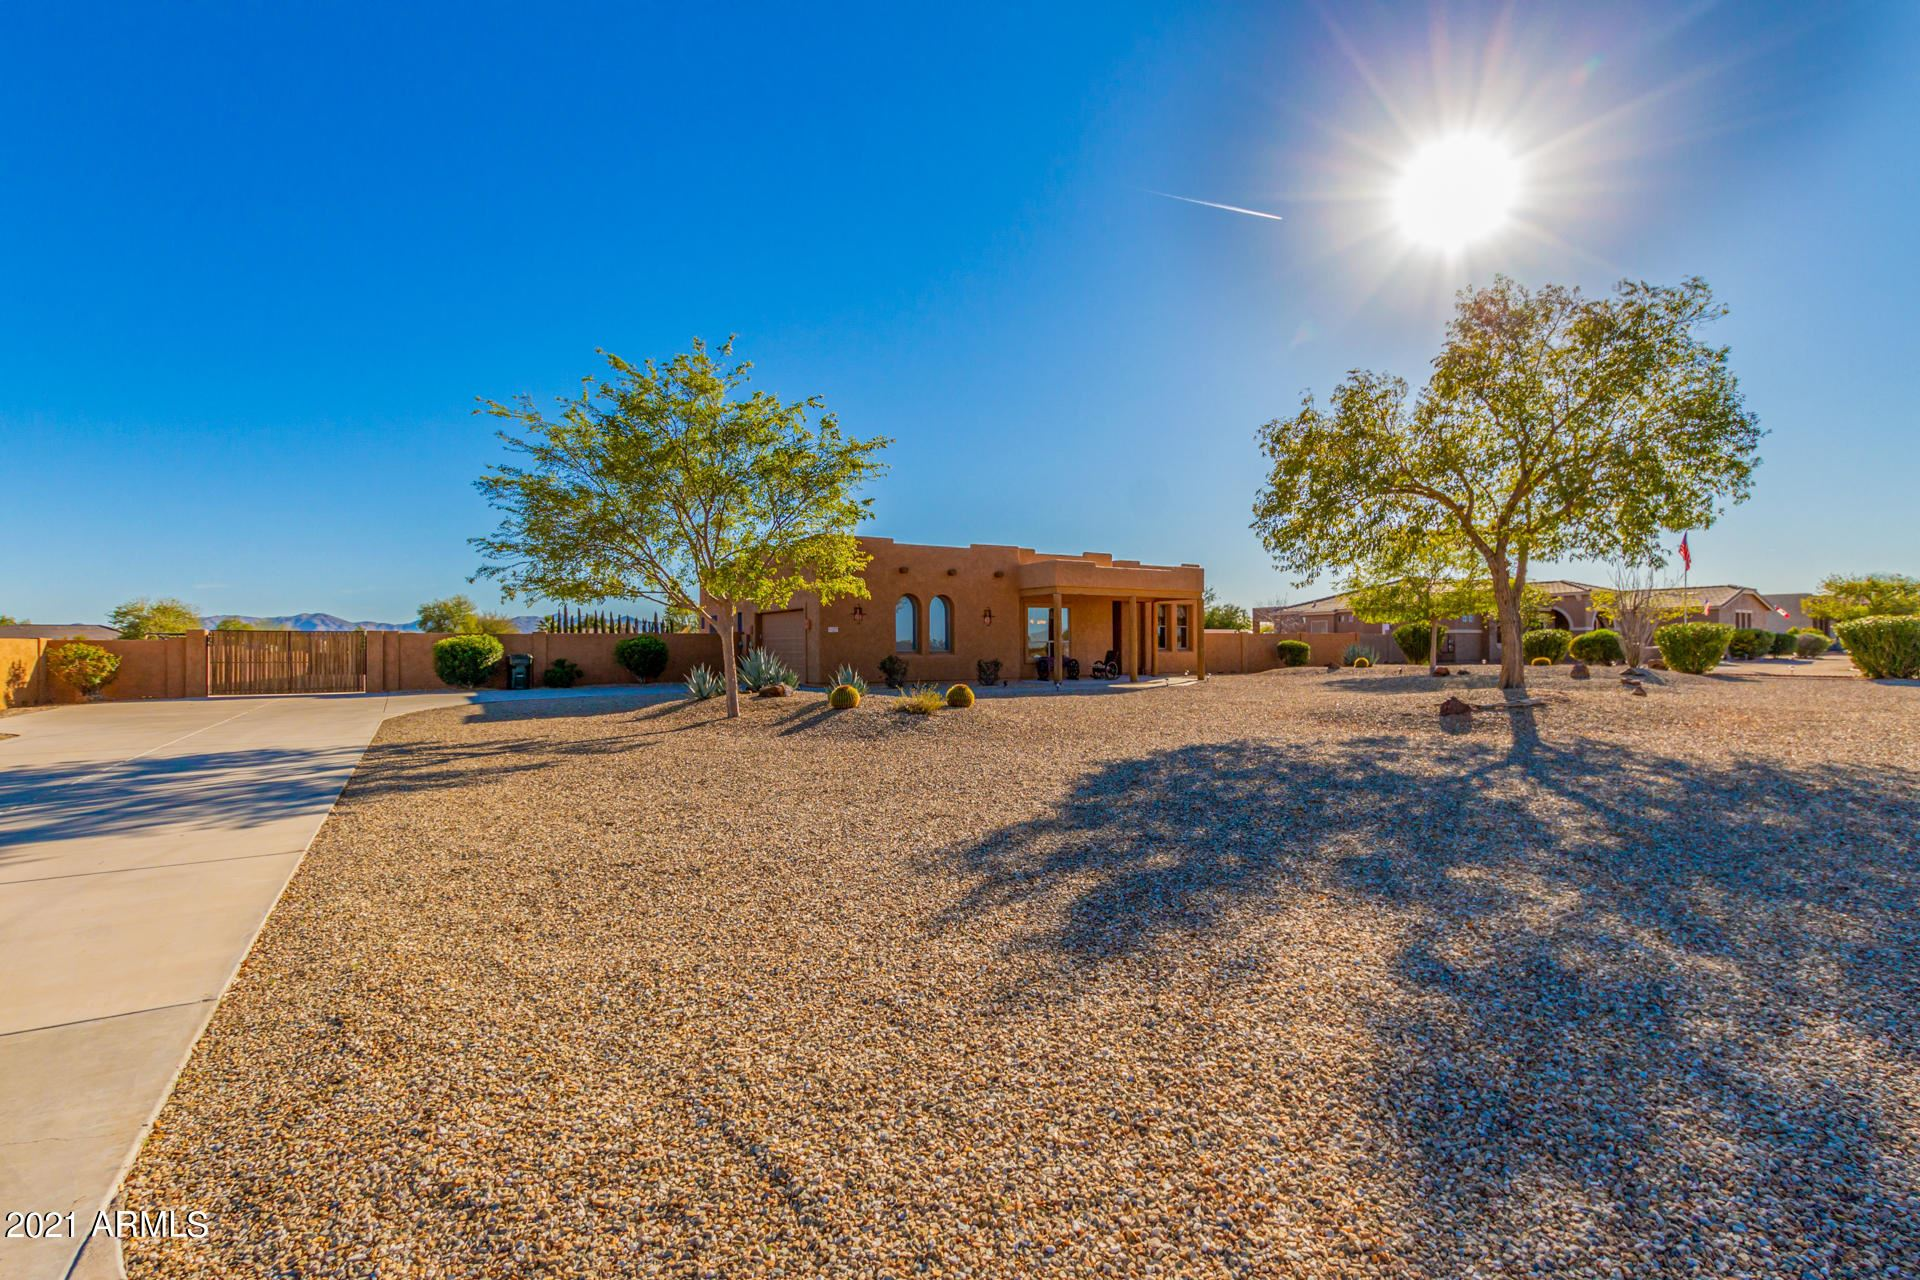 Photo of 22931 W PEAK VIEW Road, Wittmann, AZ 85361 (MLS # 6200908)